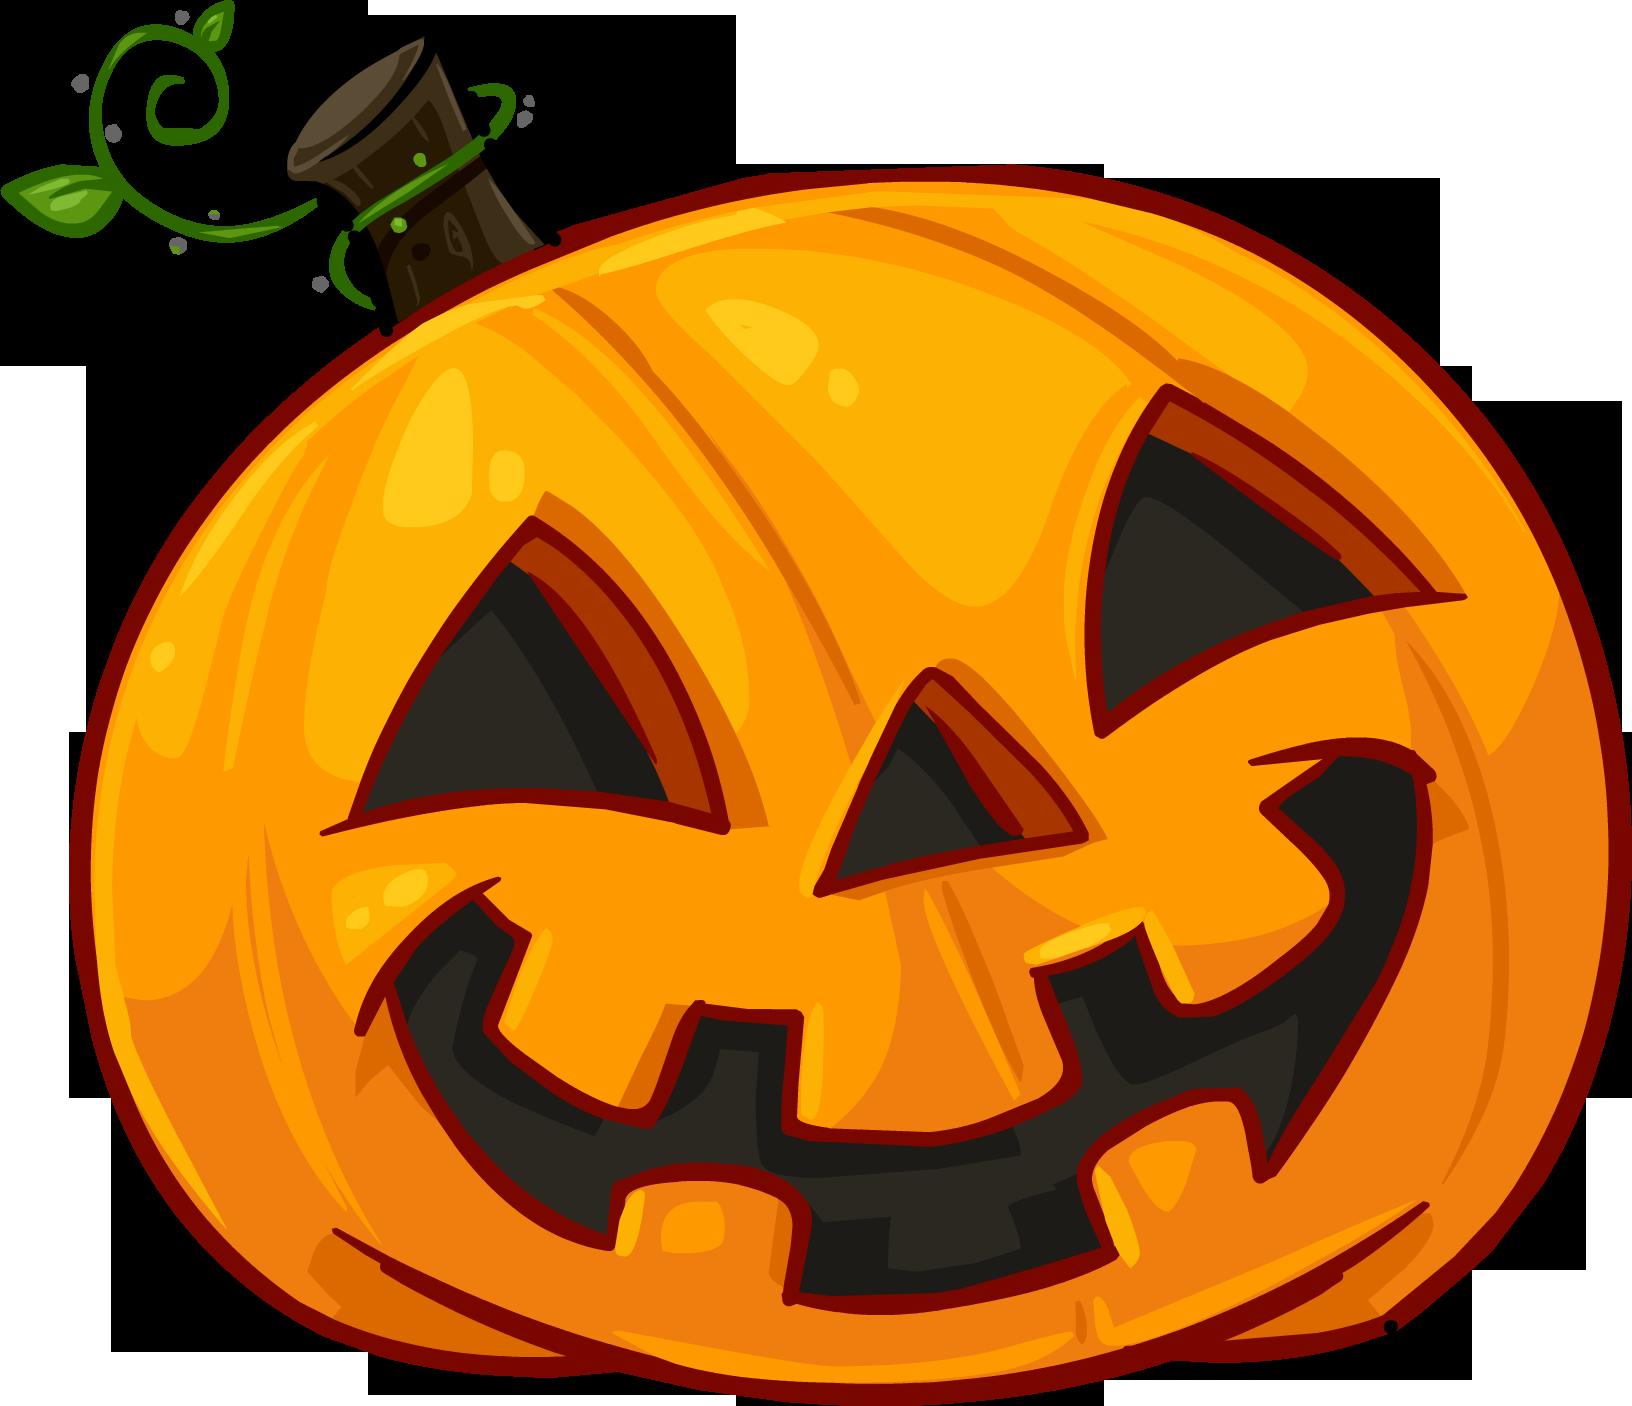 Pumpkin PNG - 27279